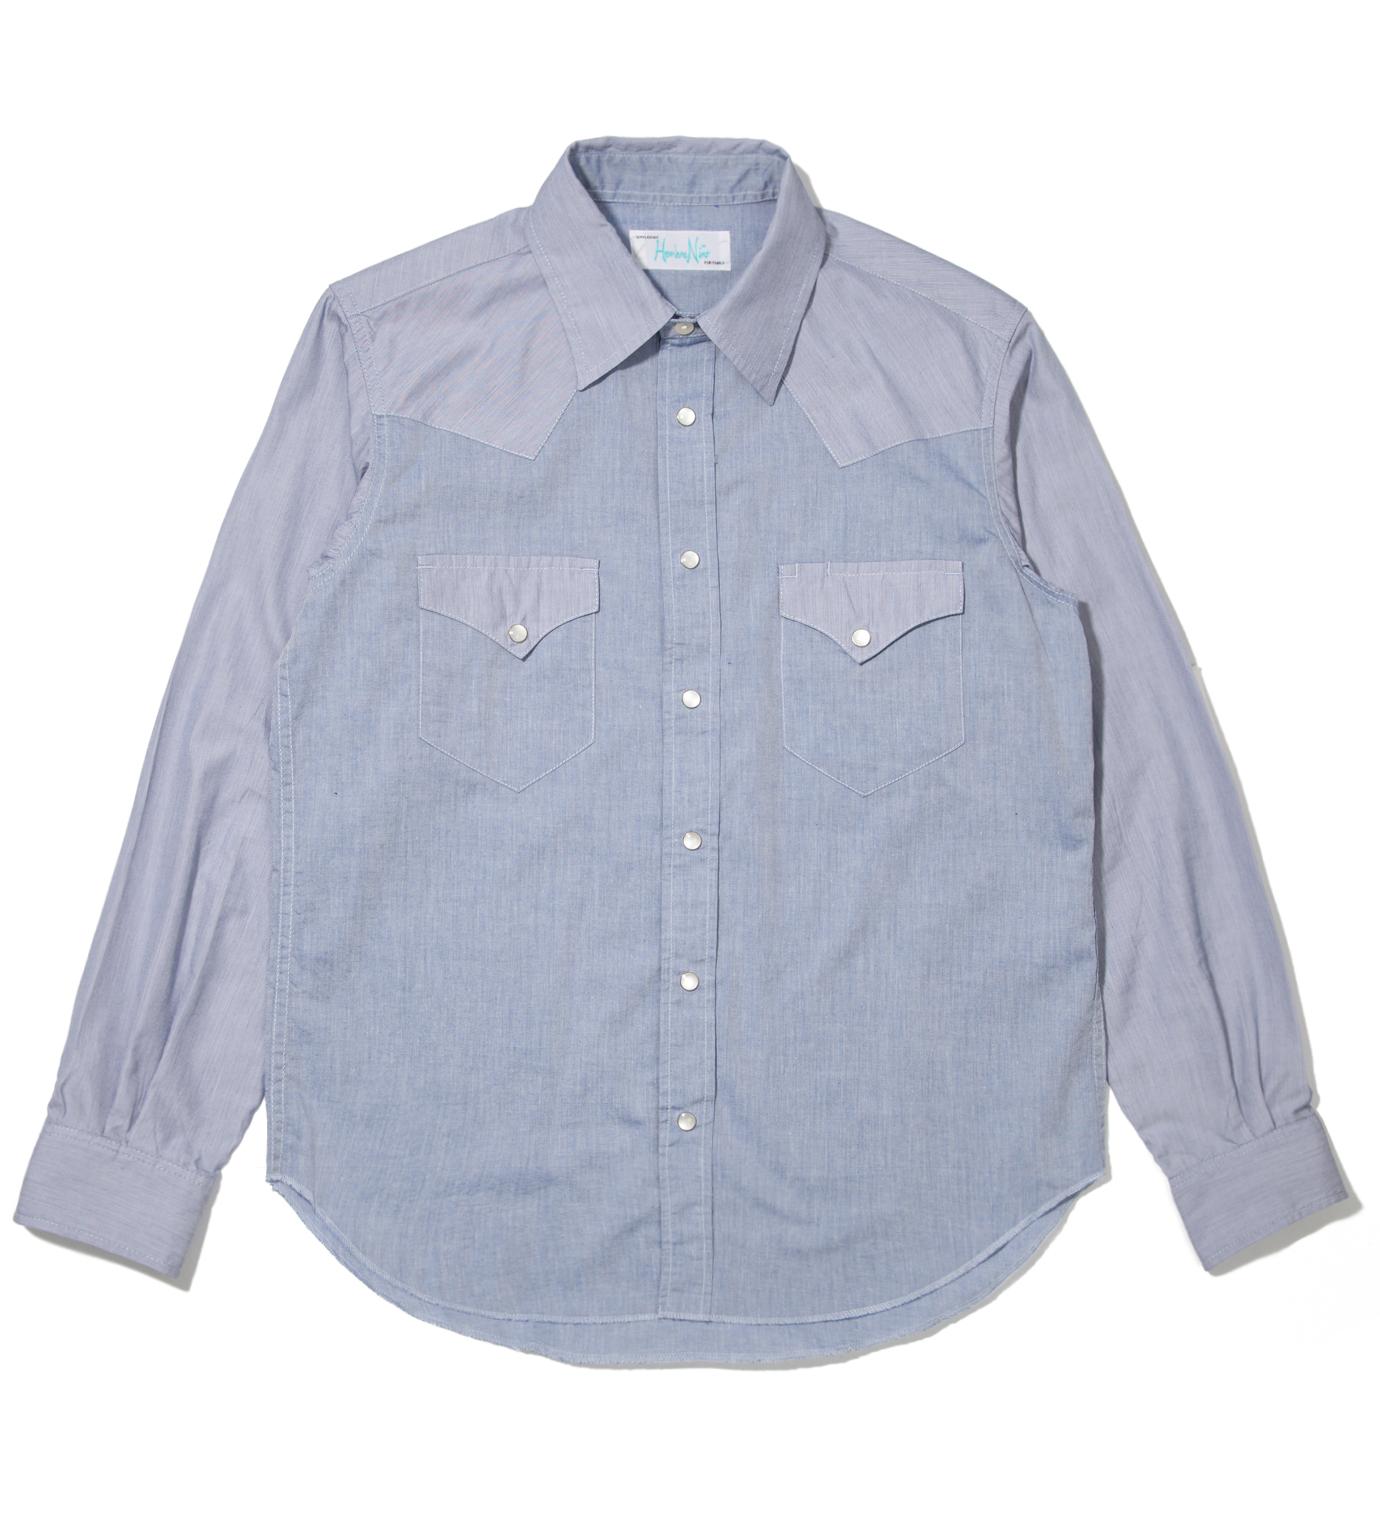 Hombre Nino Blue Western Shirt